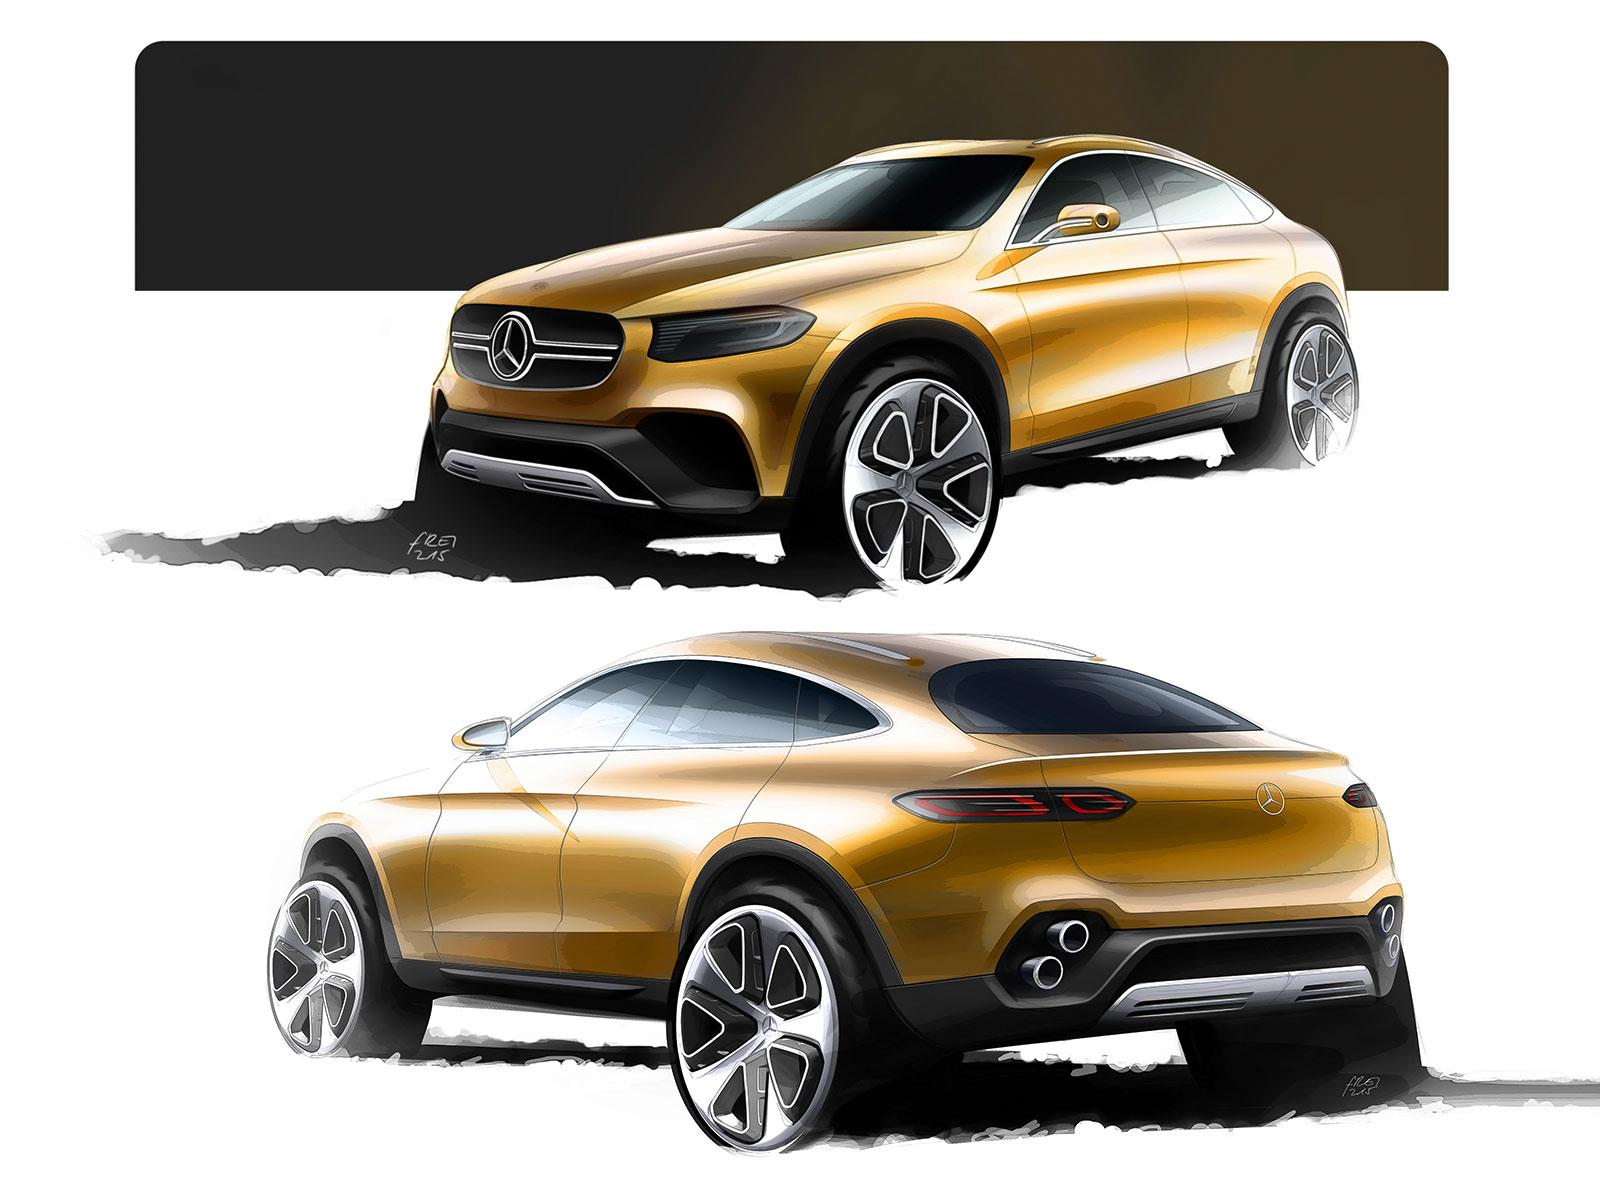 Mercedes benz concept glc coupe design sketches car for Mercedes benz concept coupe suv interior